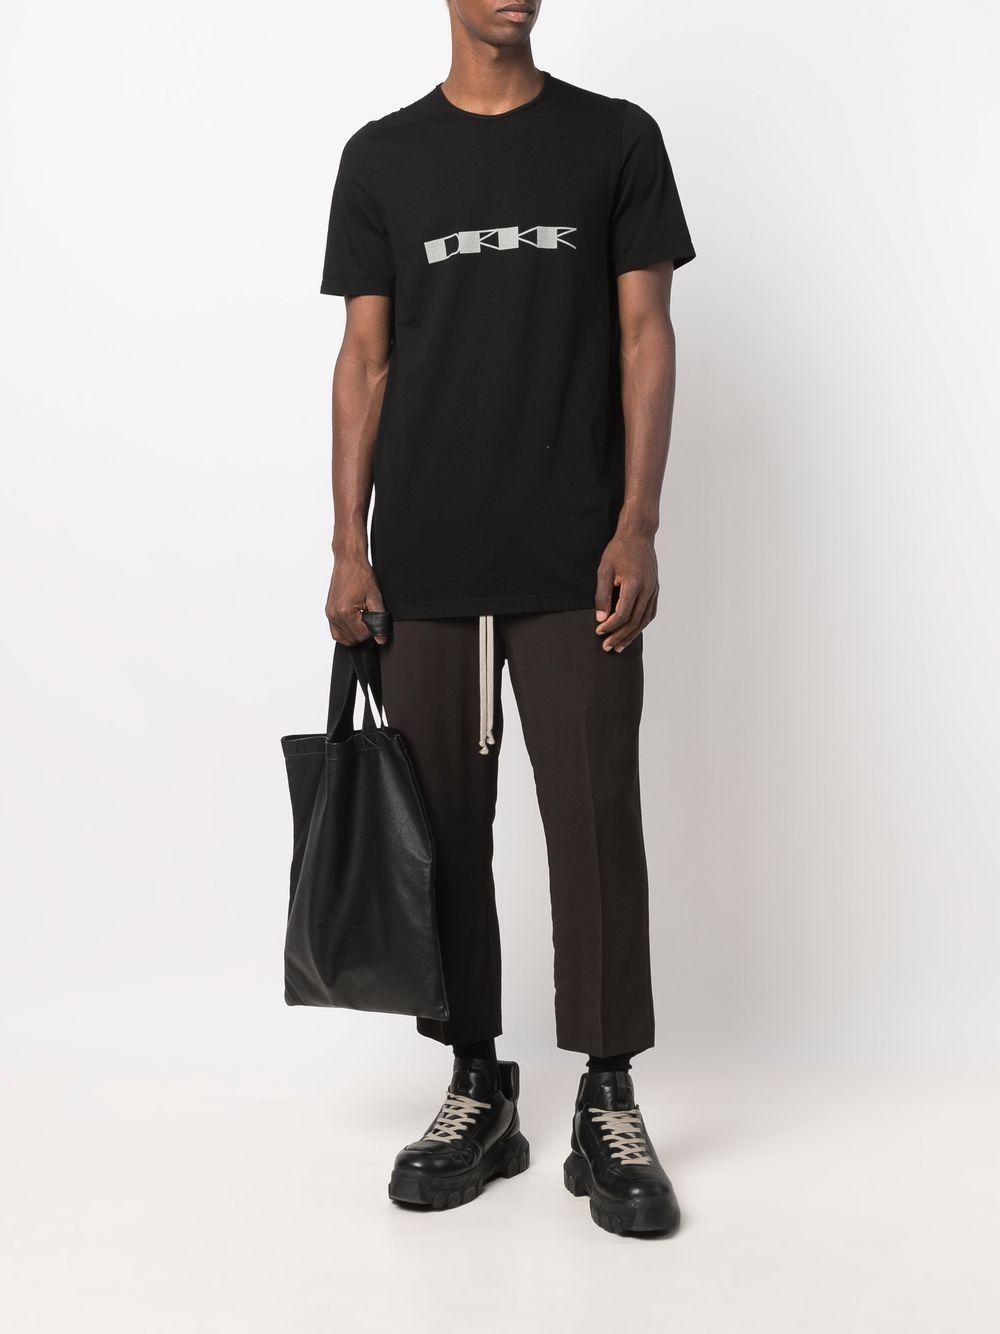 t-shirt level uomo nera in cotone RICK OWENS DRKSHDW | T-shirt | DU02A3250 RNEP60961